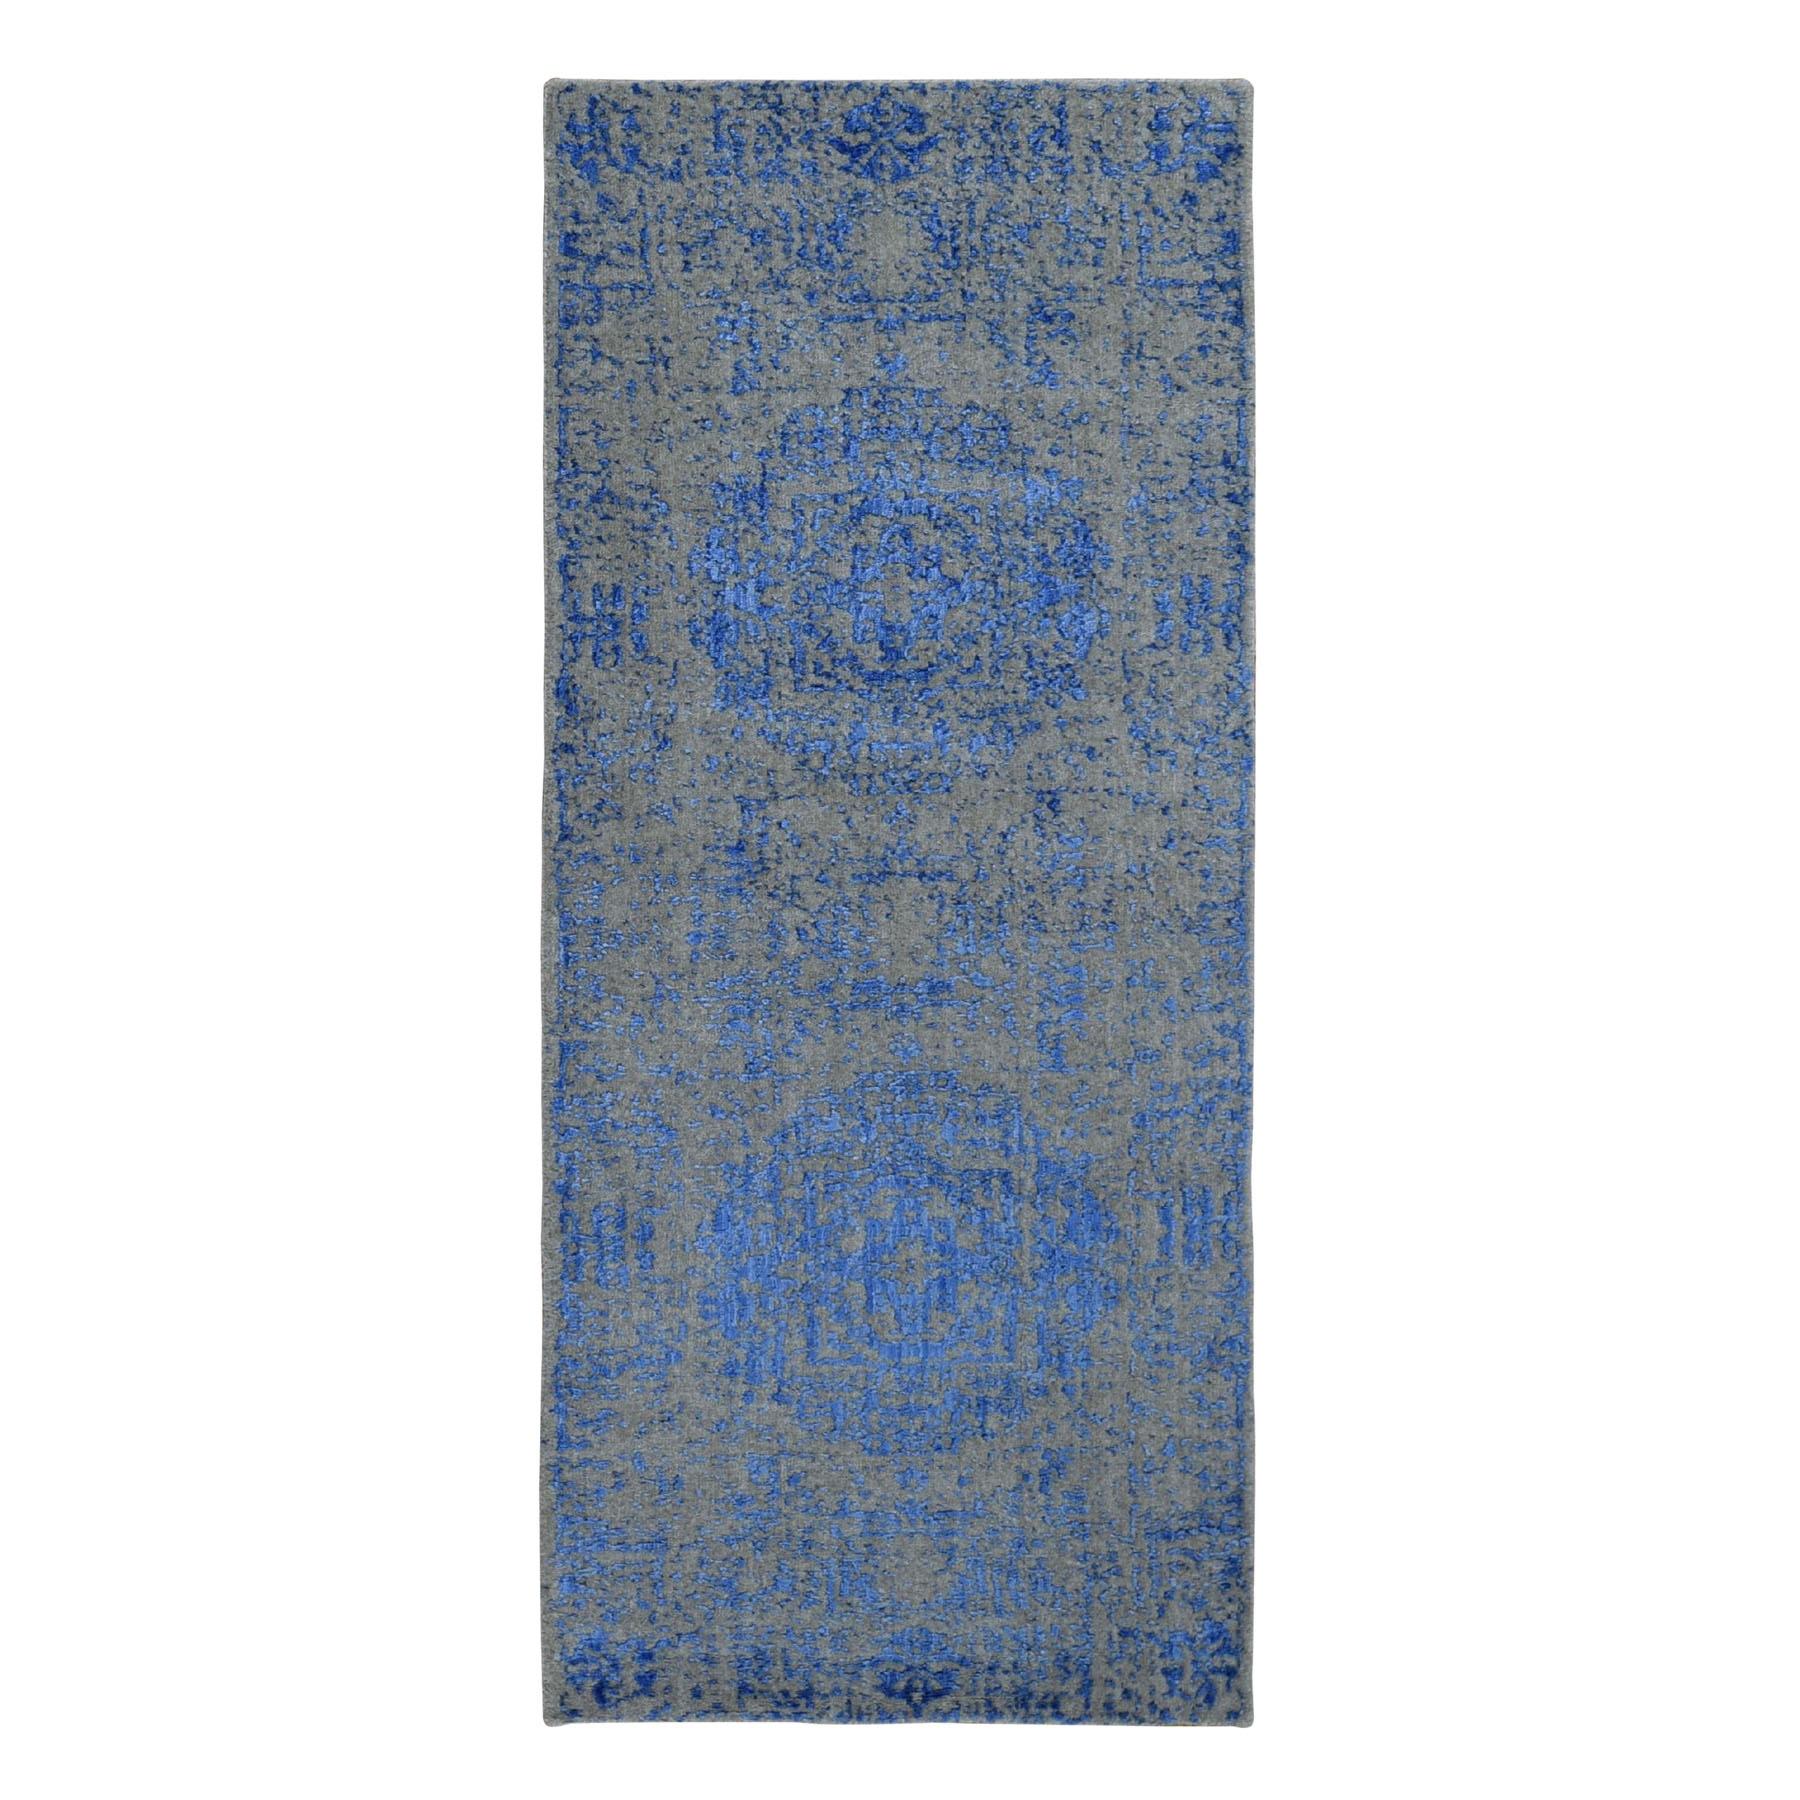 "2'5""x6'1"" Blue Fine jacquard Mamluk Design Hand loomed Wool And Art Silk Oriental Rug"